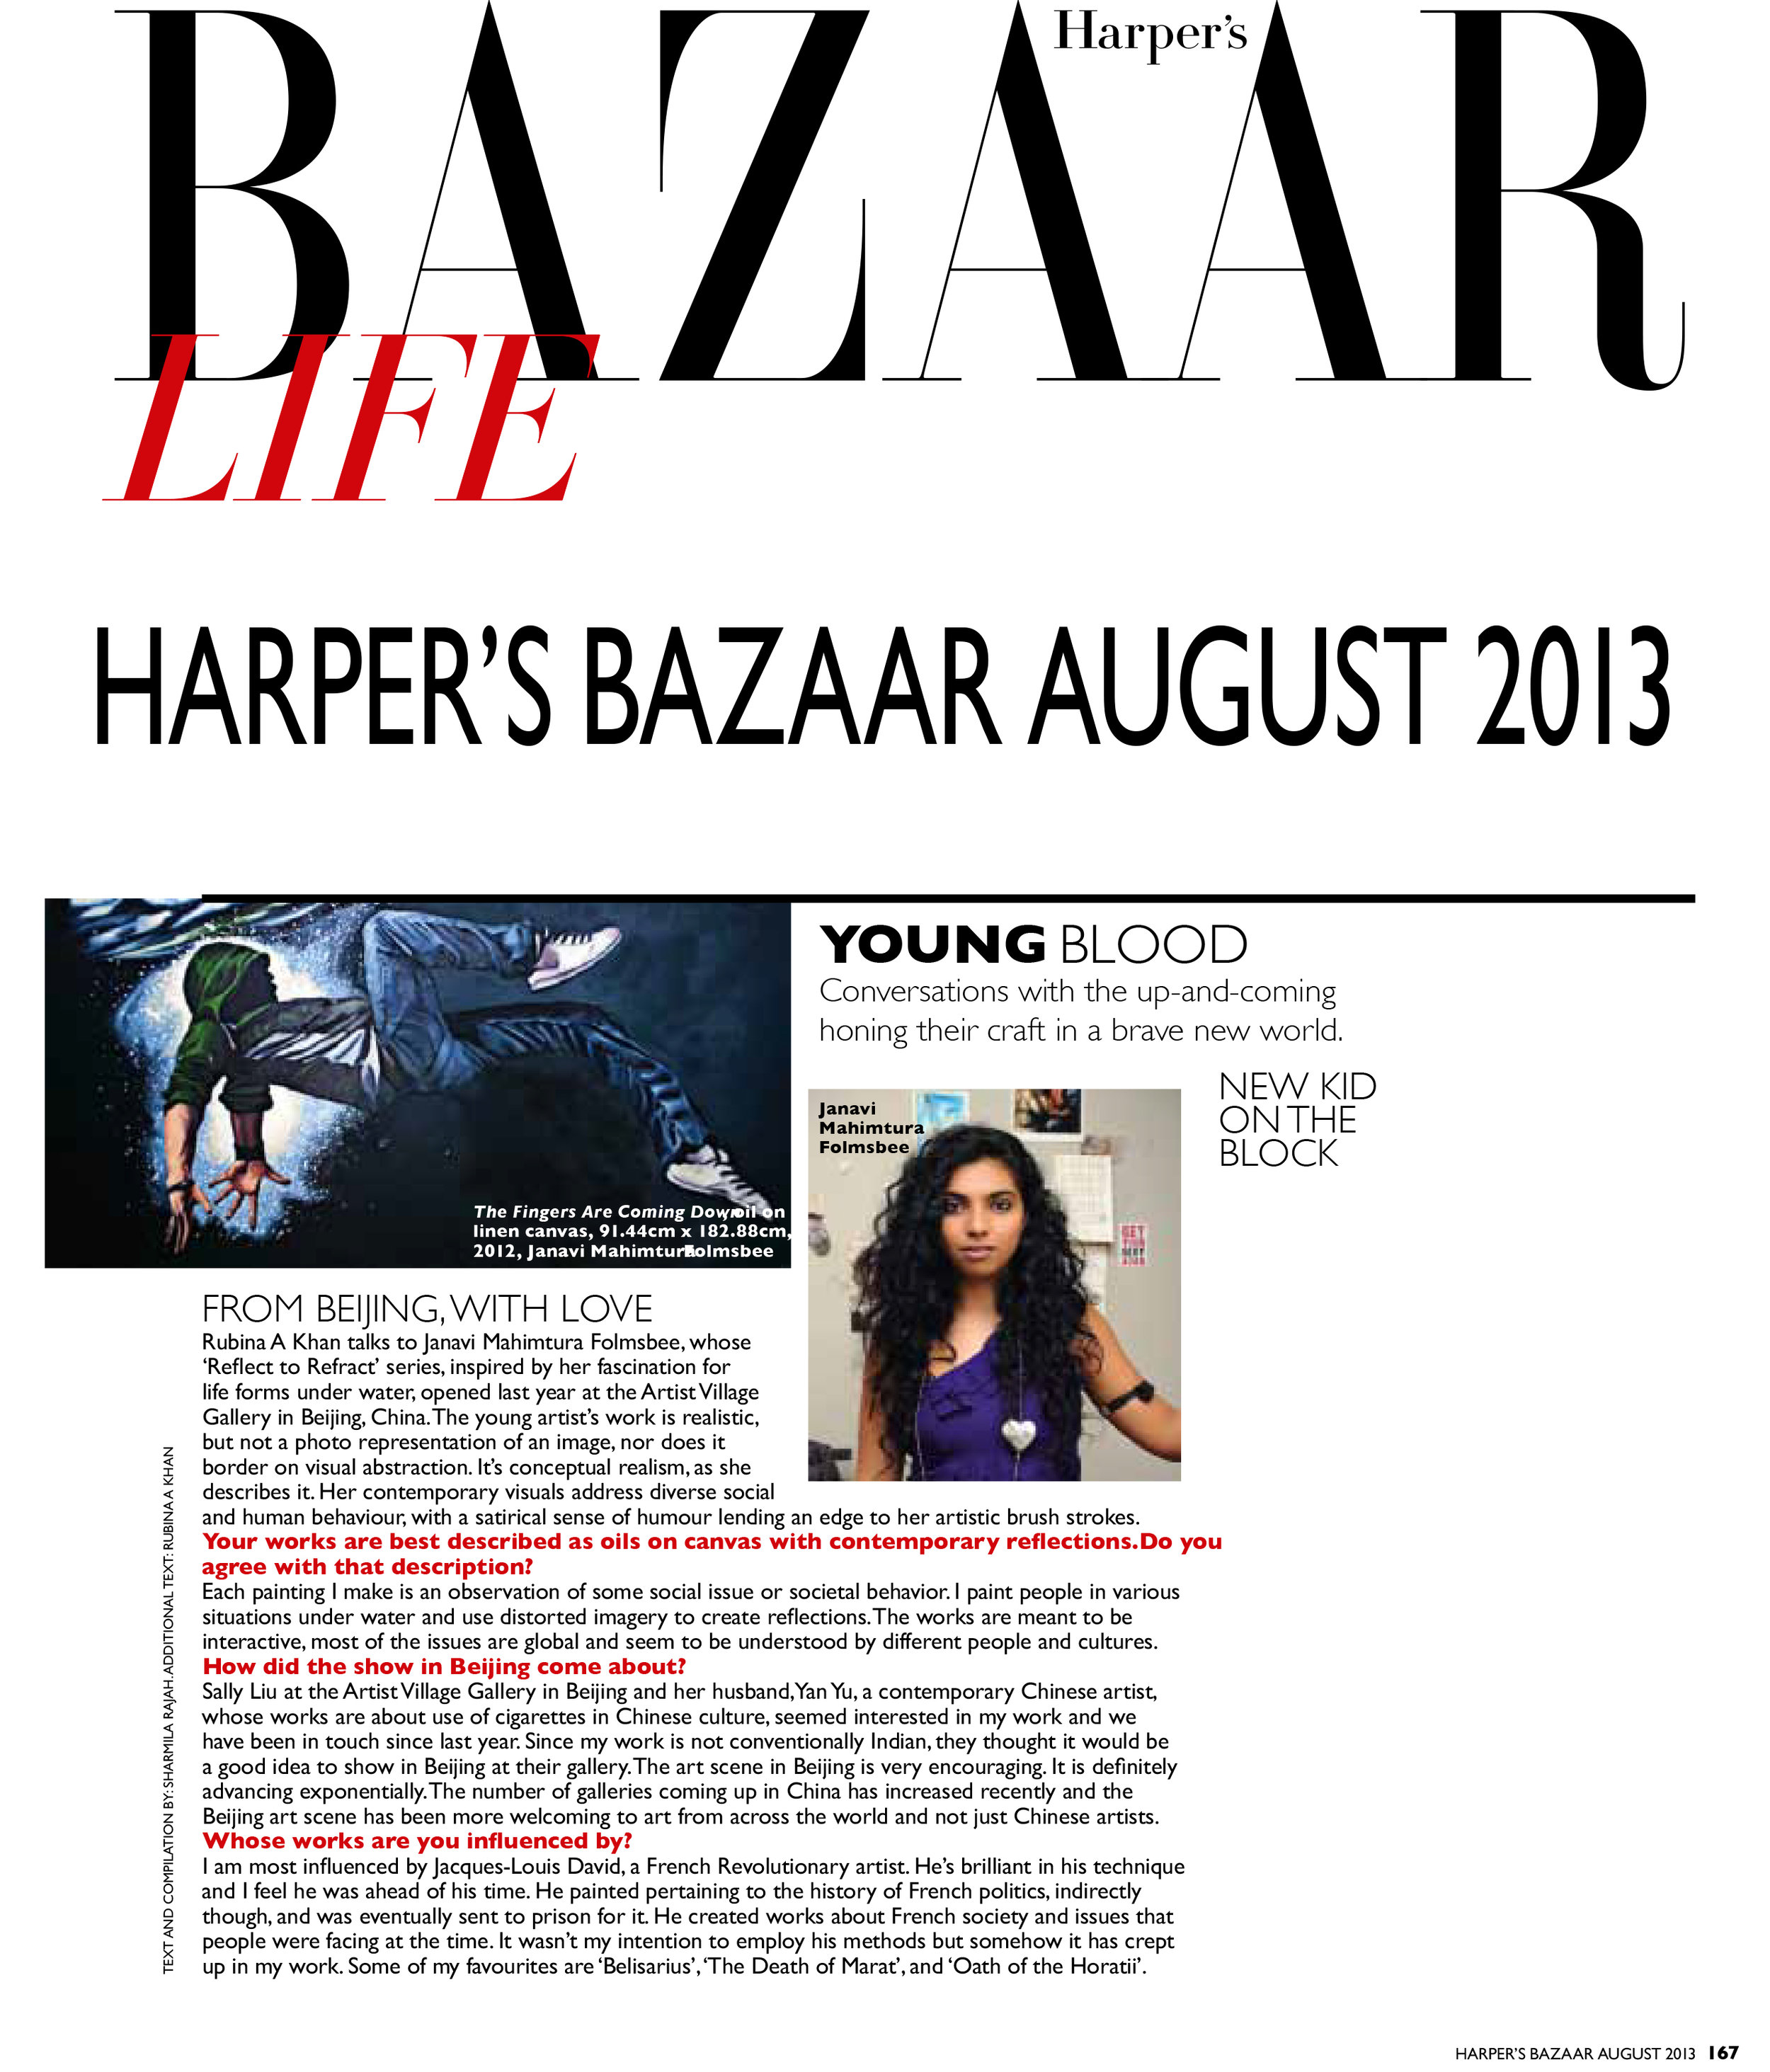 - HARPER'S BAZAAR - MALASIA 2013